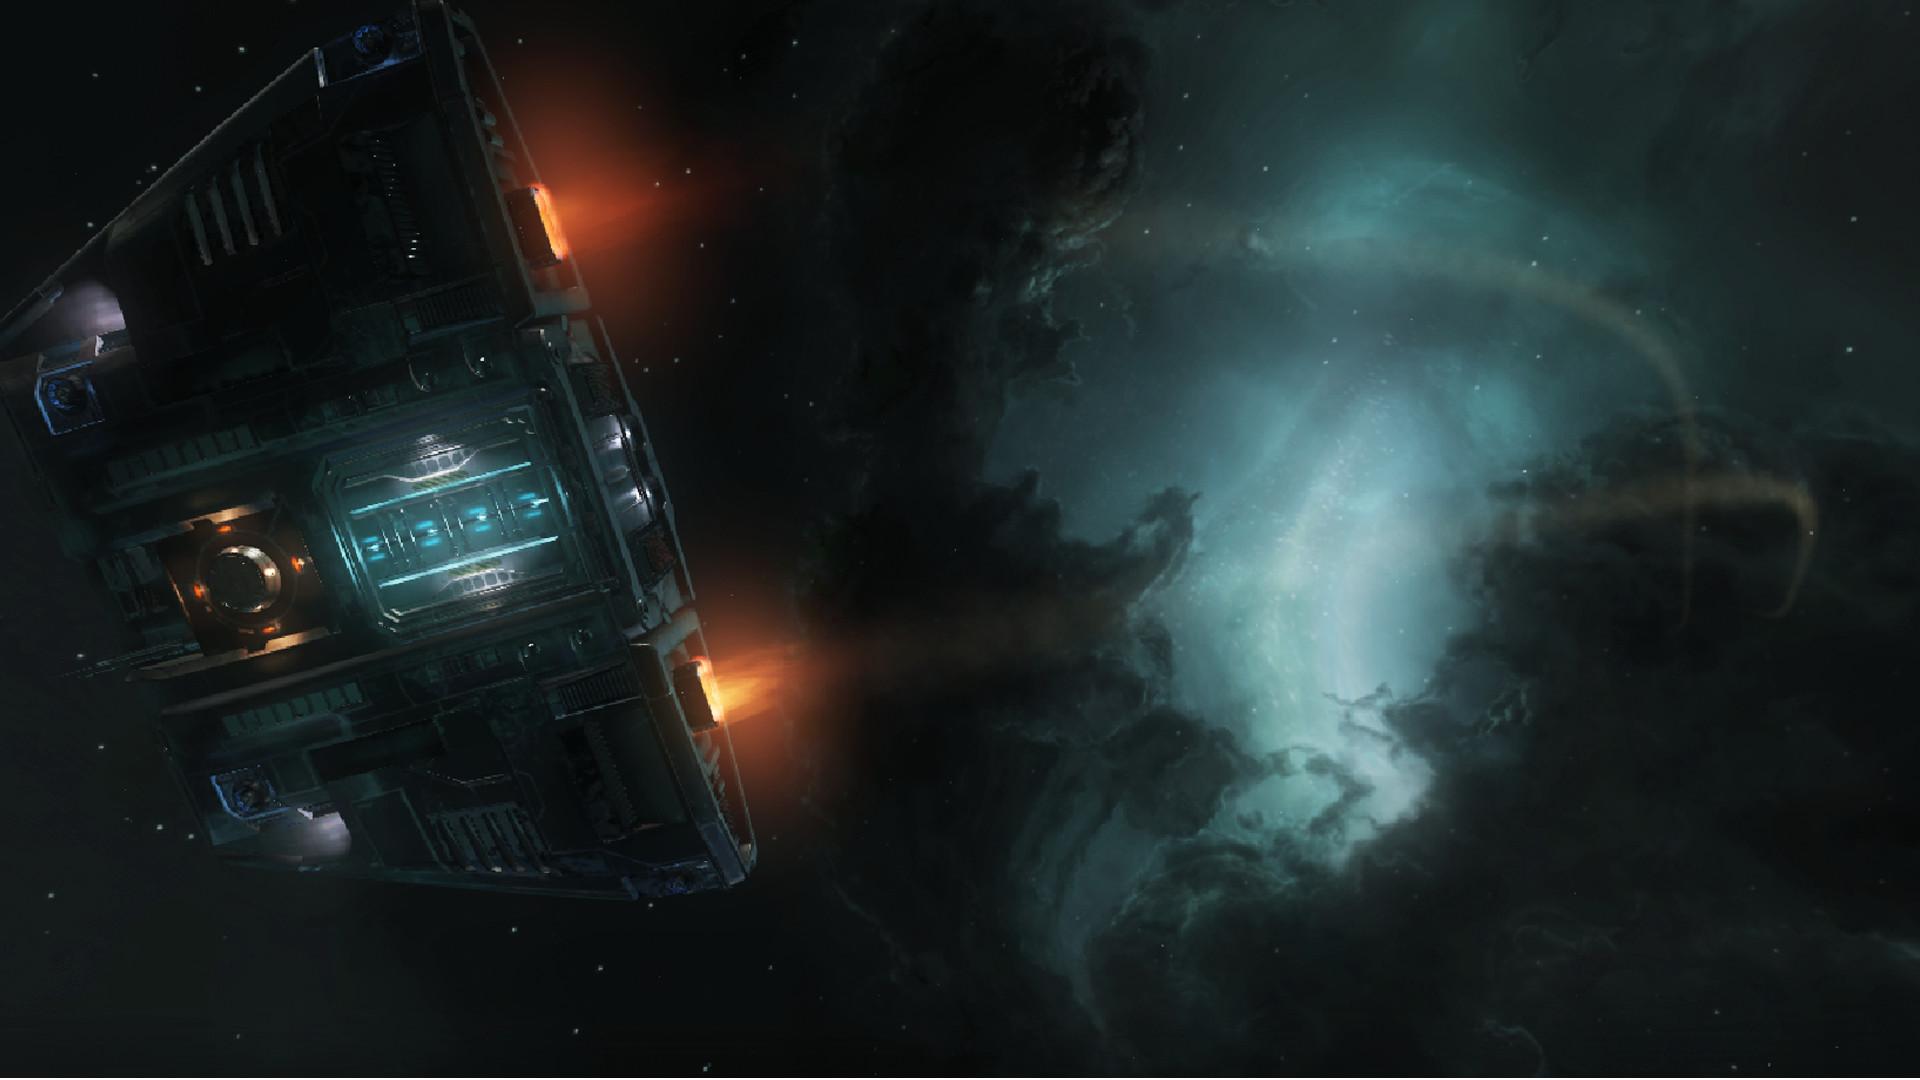 ELITE DANGEROUS sci-fi spaceship game rs wallpaper     167512    WallpaperUP